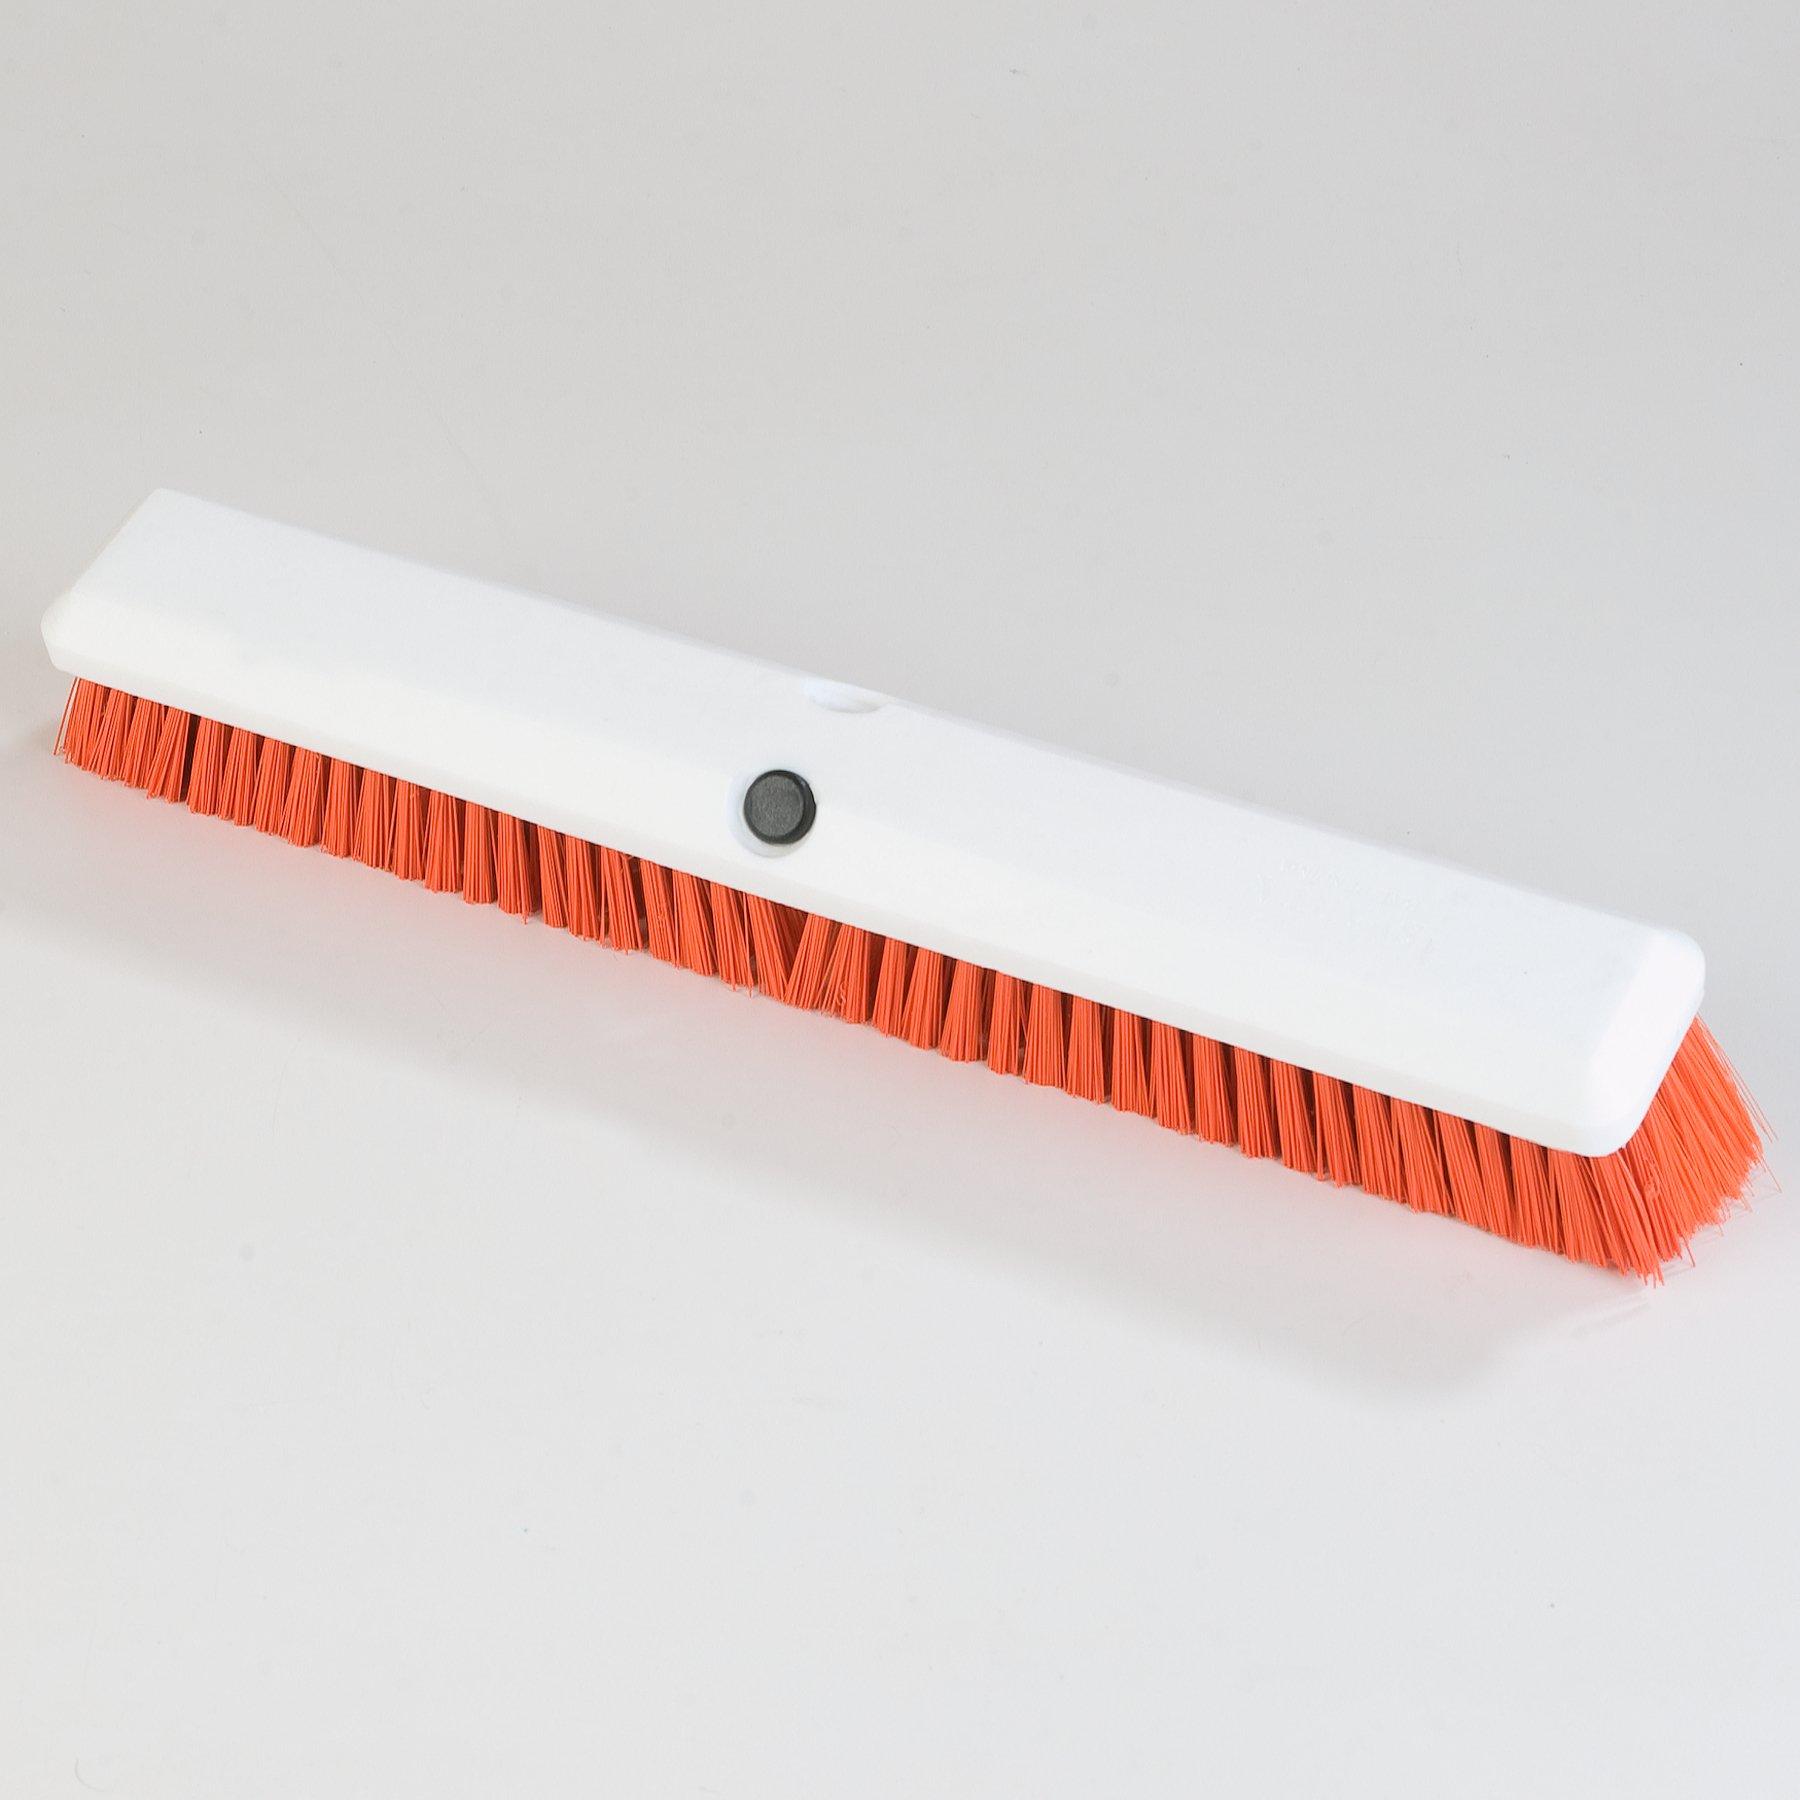 Carlisle 4189024 Sparta Omni Floor Sweep, 18'', Orange (Pack of 12) by Carlisle (Image #2)